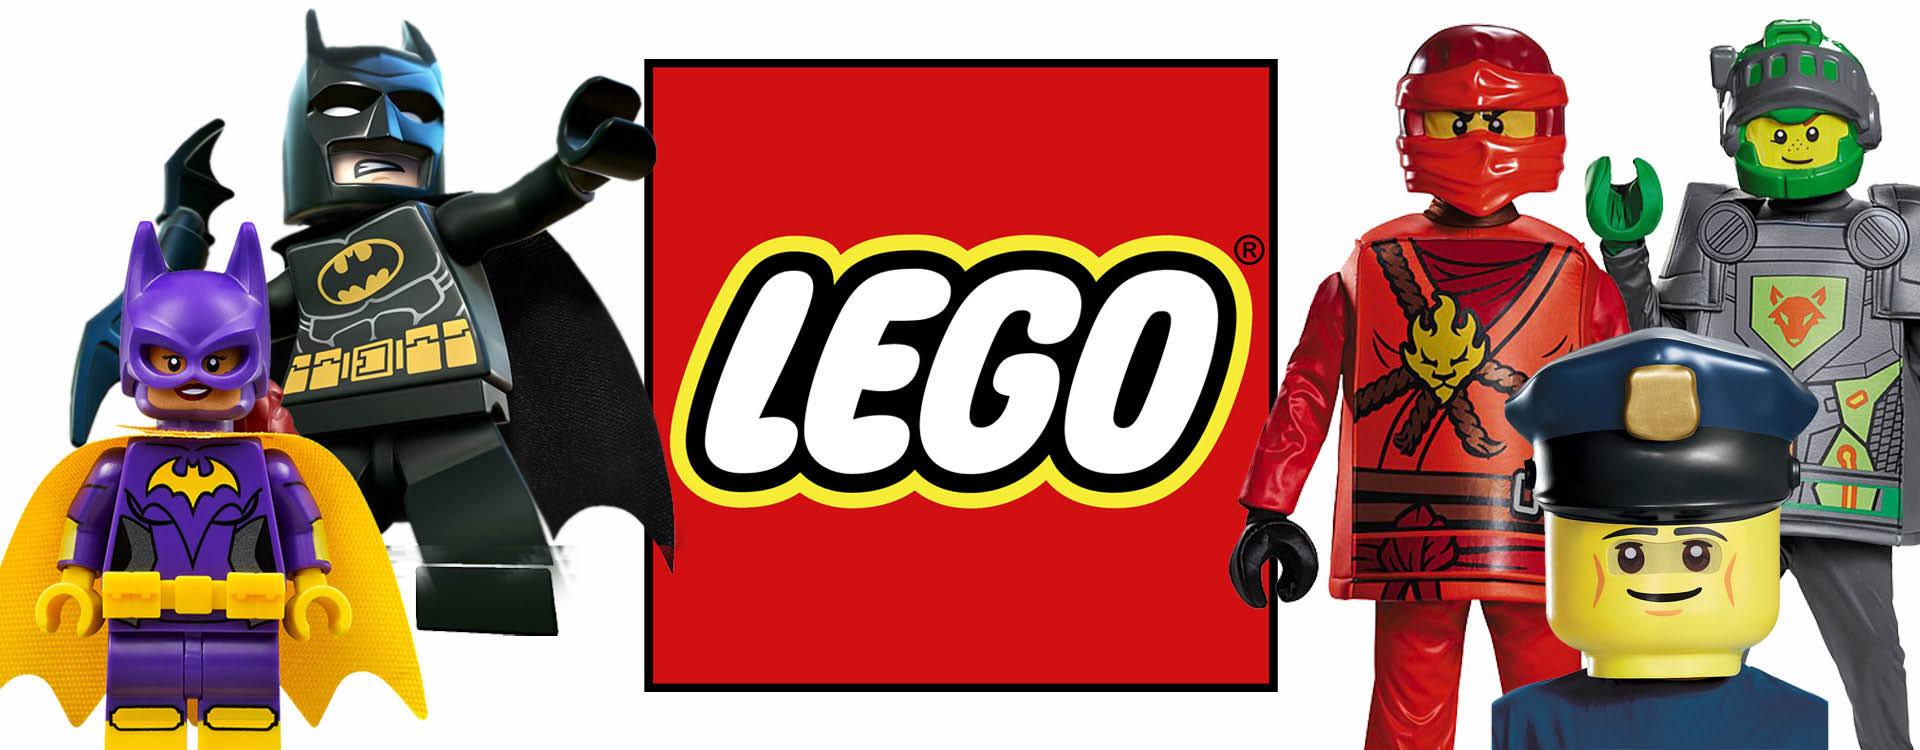 LEGO movie costumes near me LEGO movie costume coupon halloween costume coupons